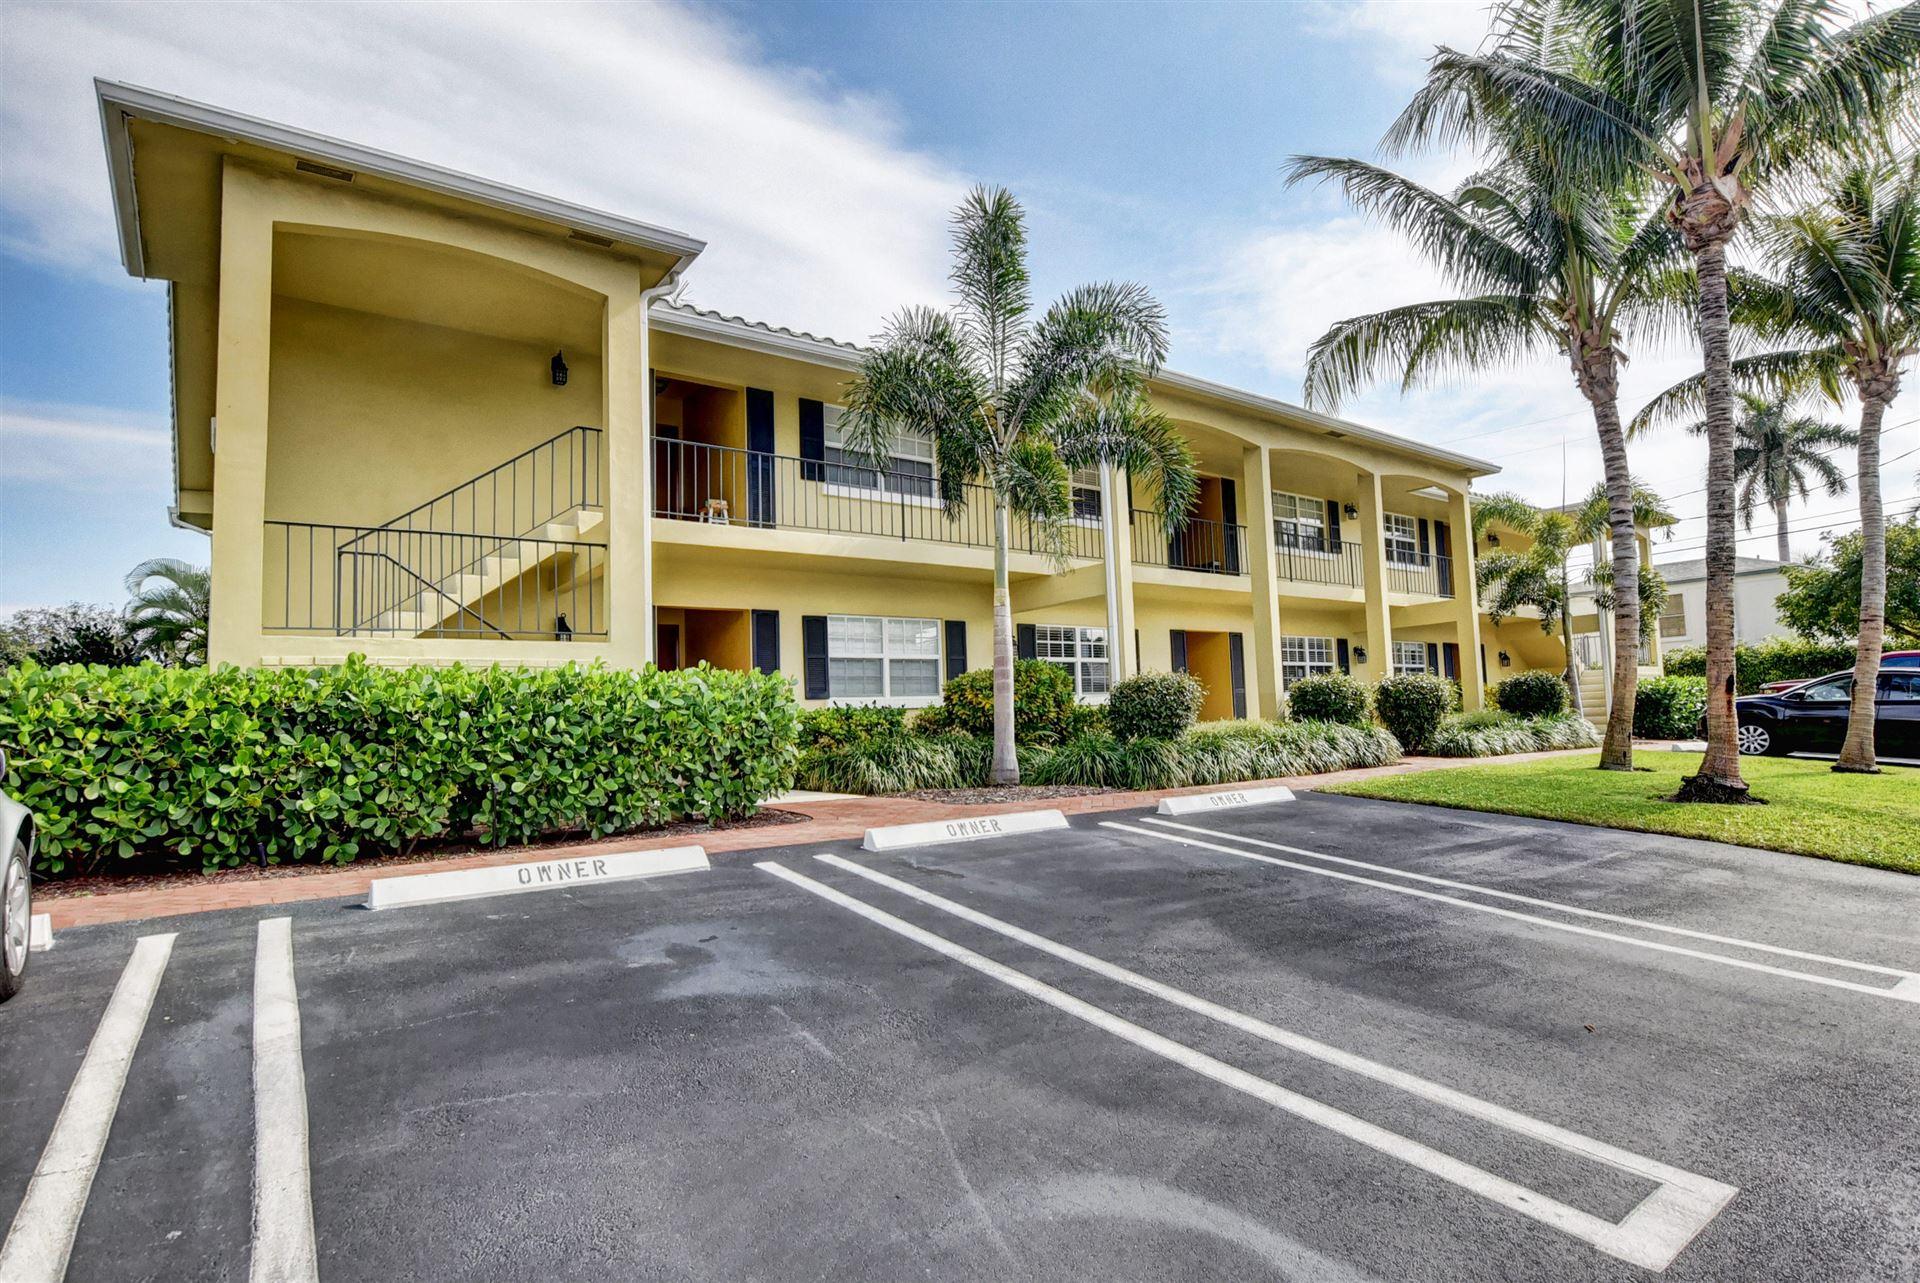 217 Gleason Street #E, Delray Beach, FL 33483 - #: RX-10629978